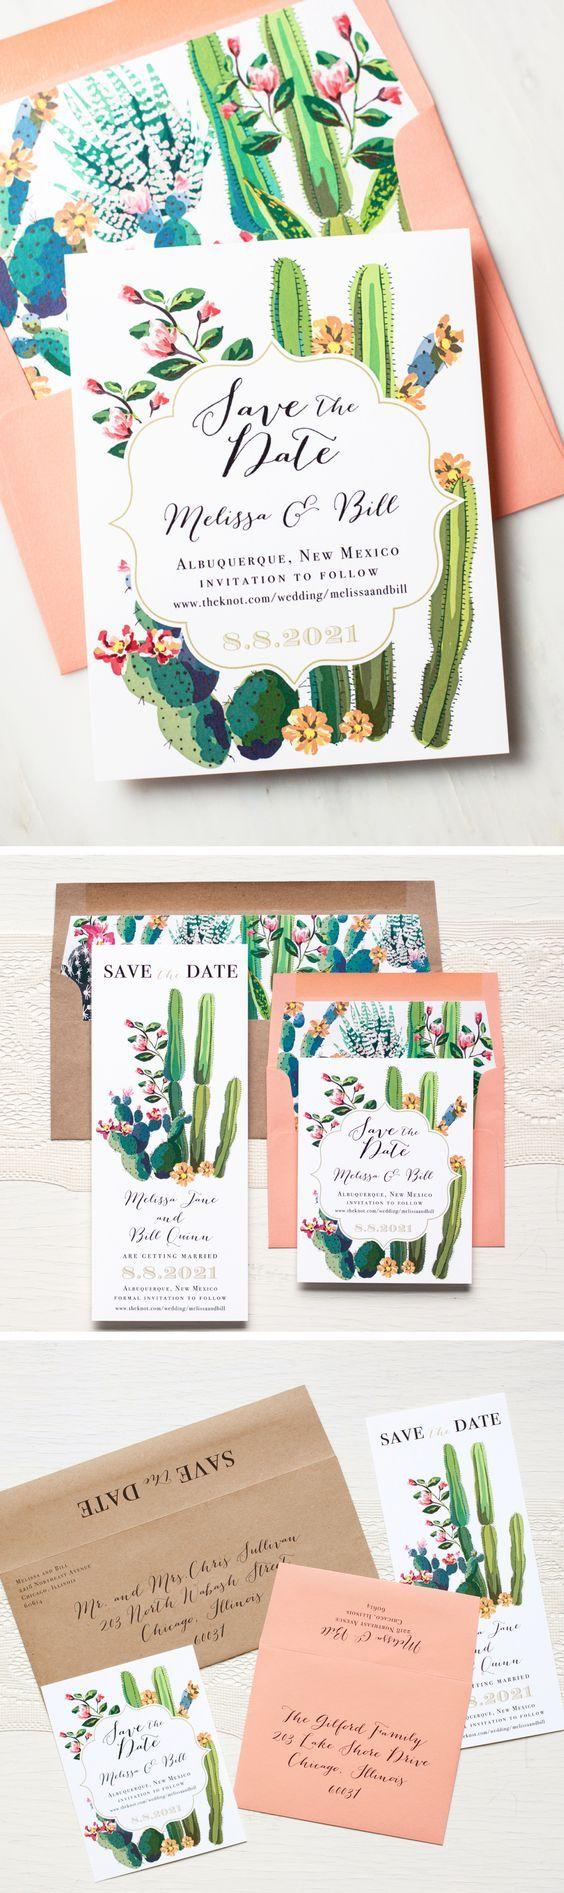 best Wedding images on Pinterest  Wedding ideas Casamento and